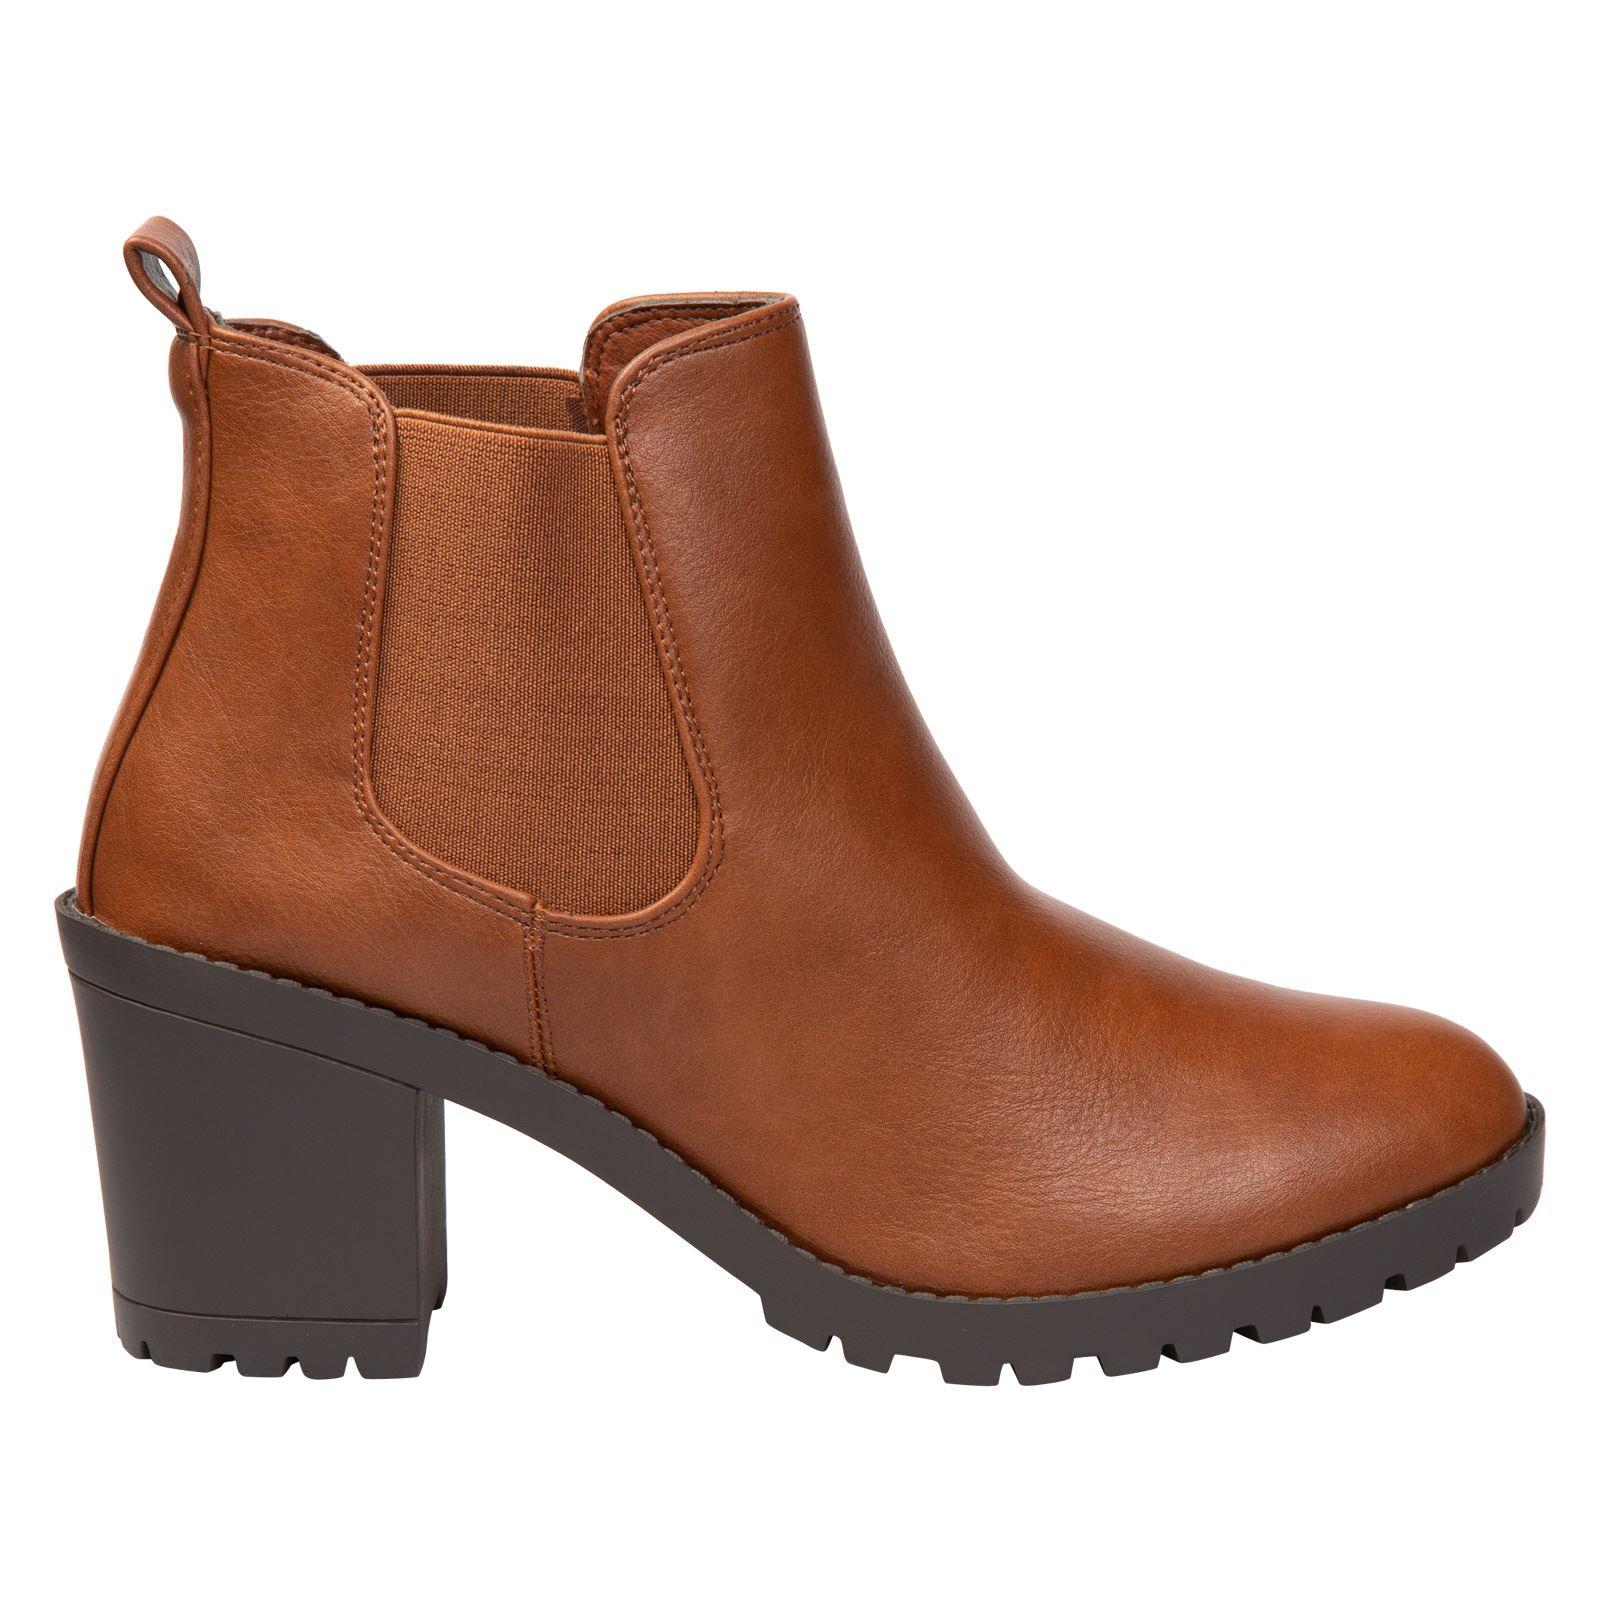 Amaya-Femme-Talon-Bloc-A-Enfiler-Chelsea-Style-Bottes-Femmes-Chaussures-Decontractees-Taille